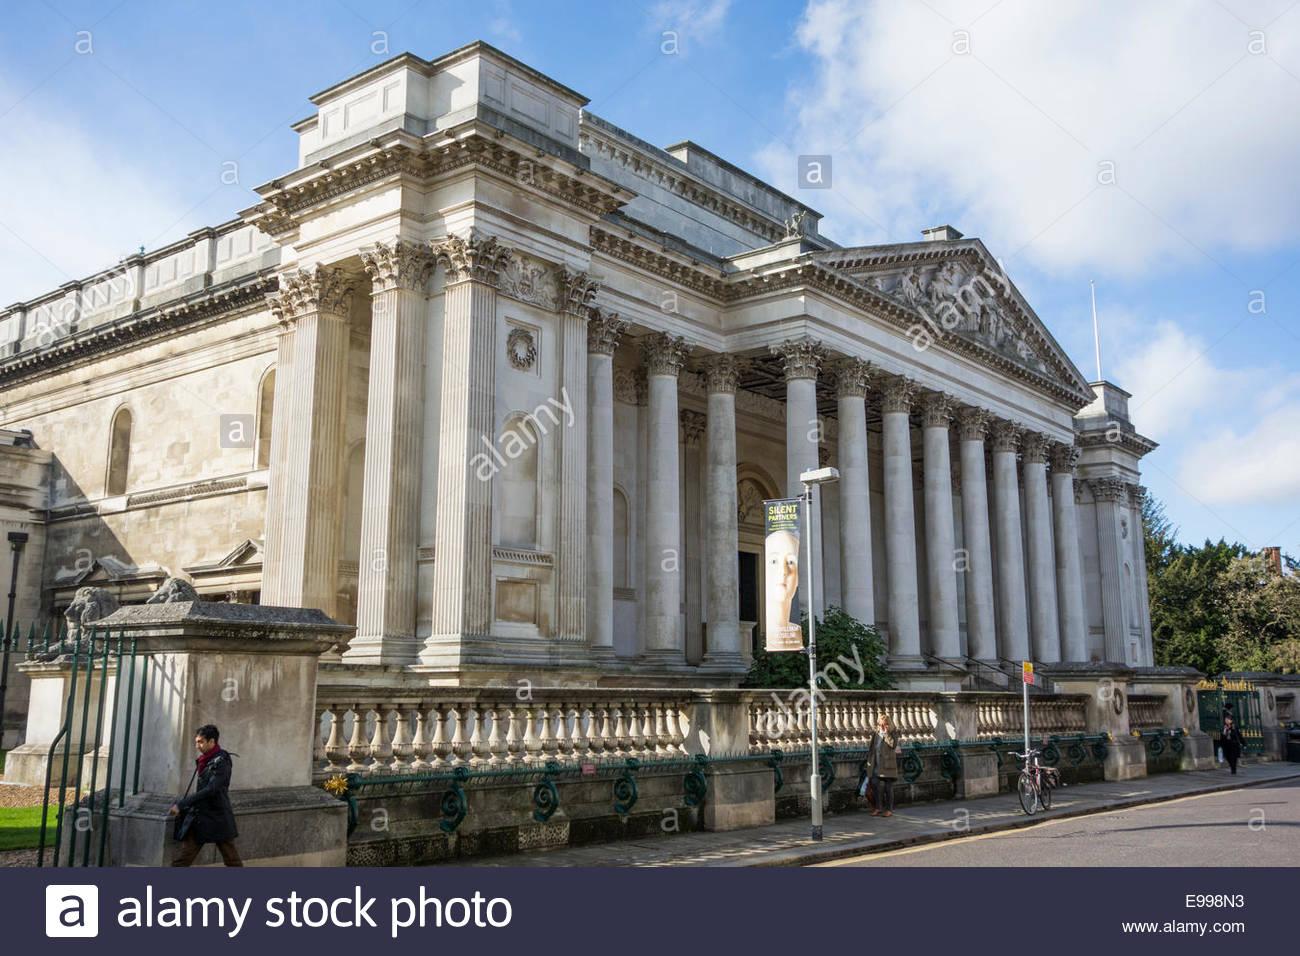 The Fitzwilliam Museum, Trumpington Street, Cambridge, England Stock Photo